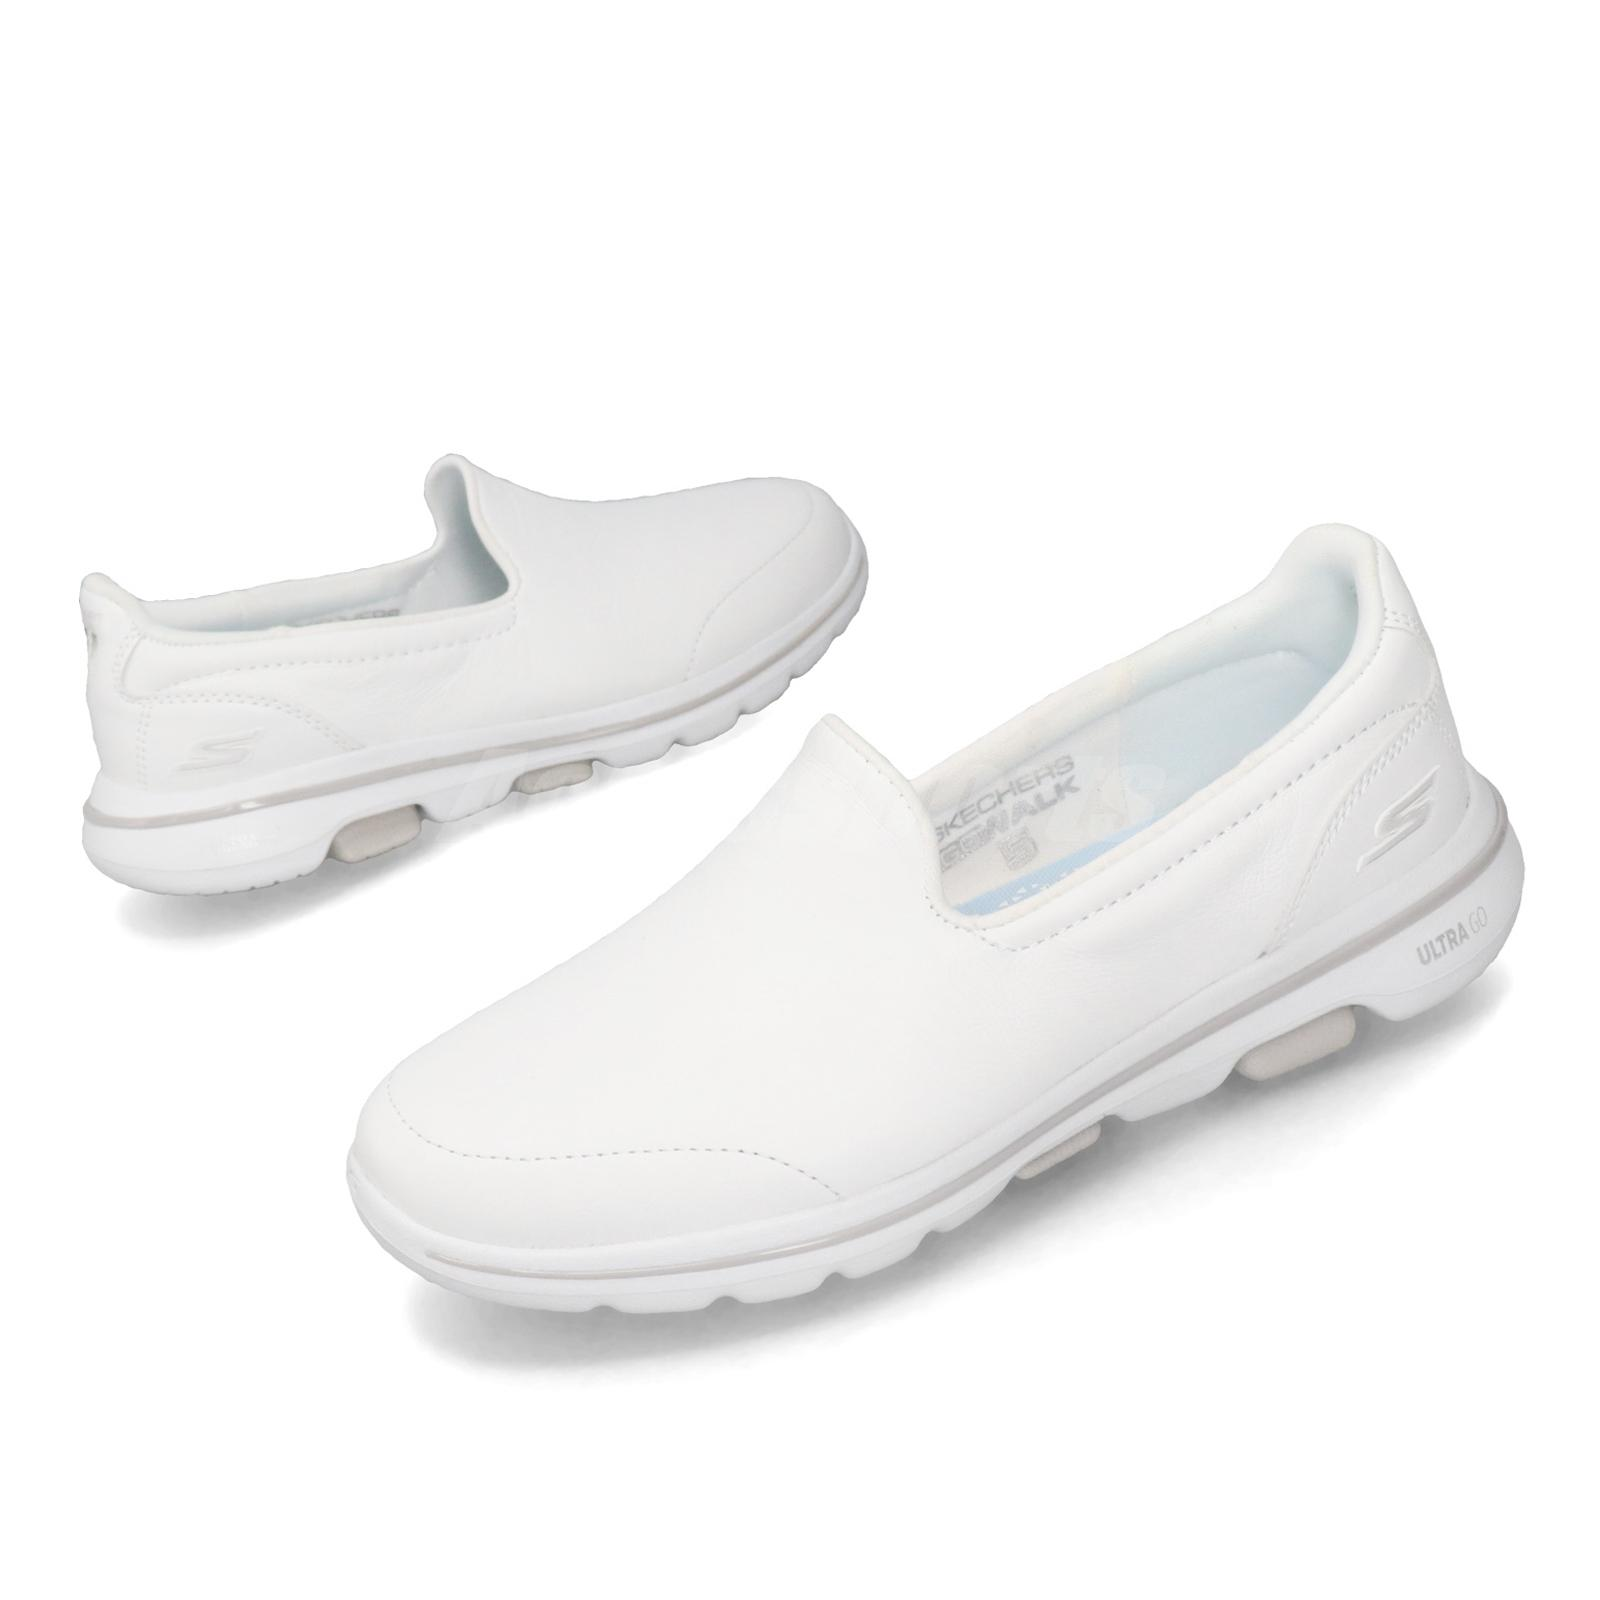 Skechers Go Walk 5-Polished White Women